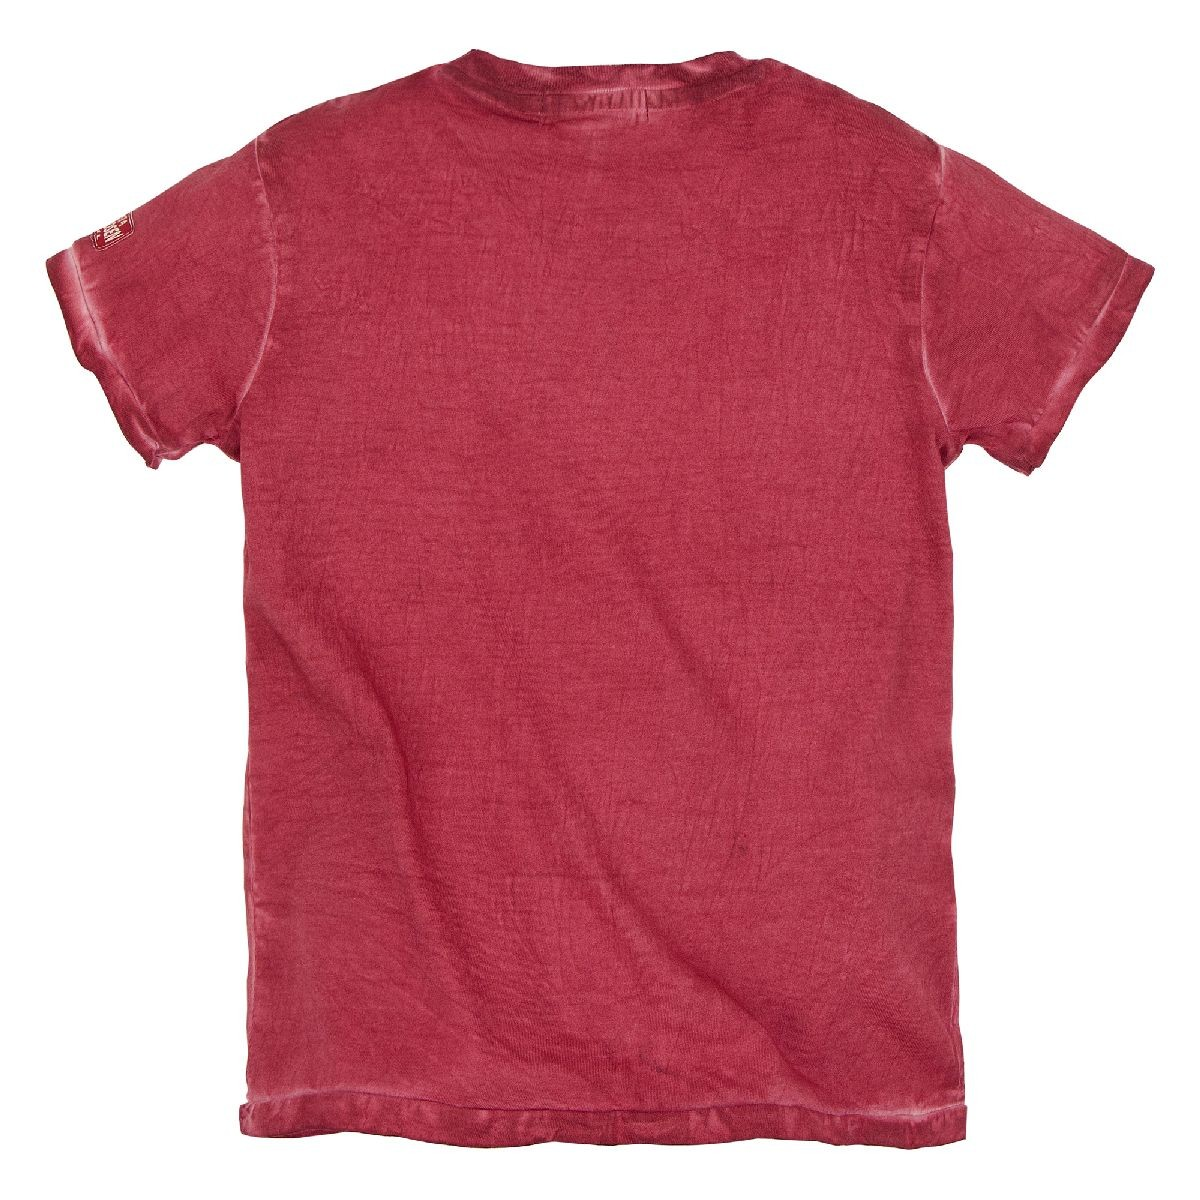 T-shirt Lederhosen Rocker'red